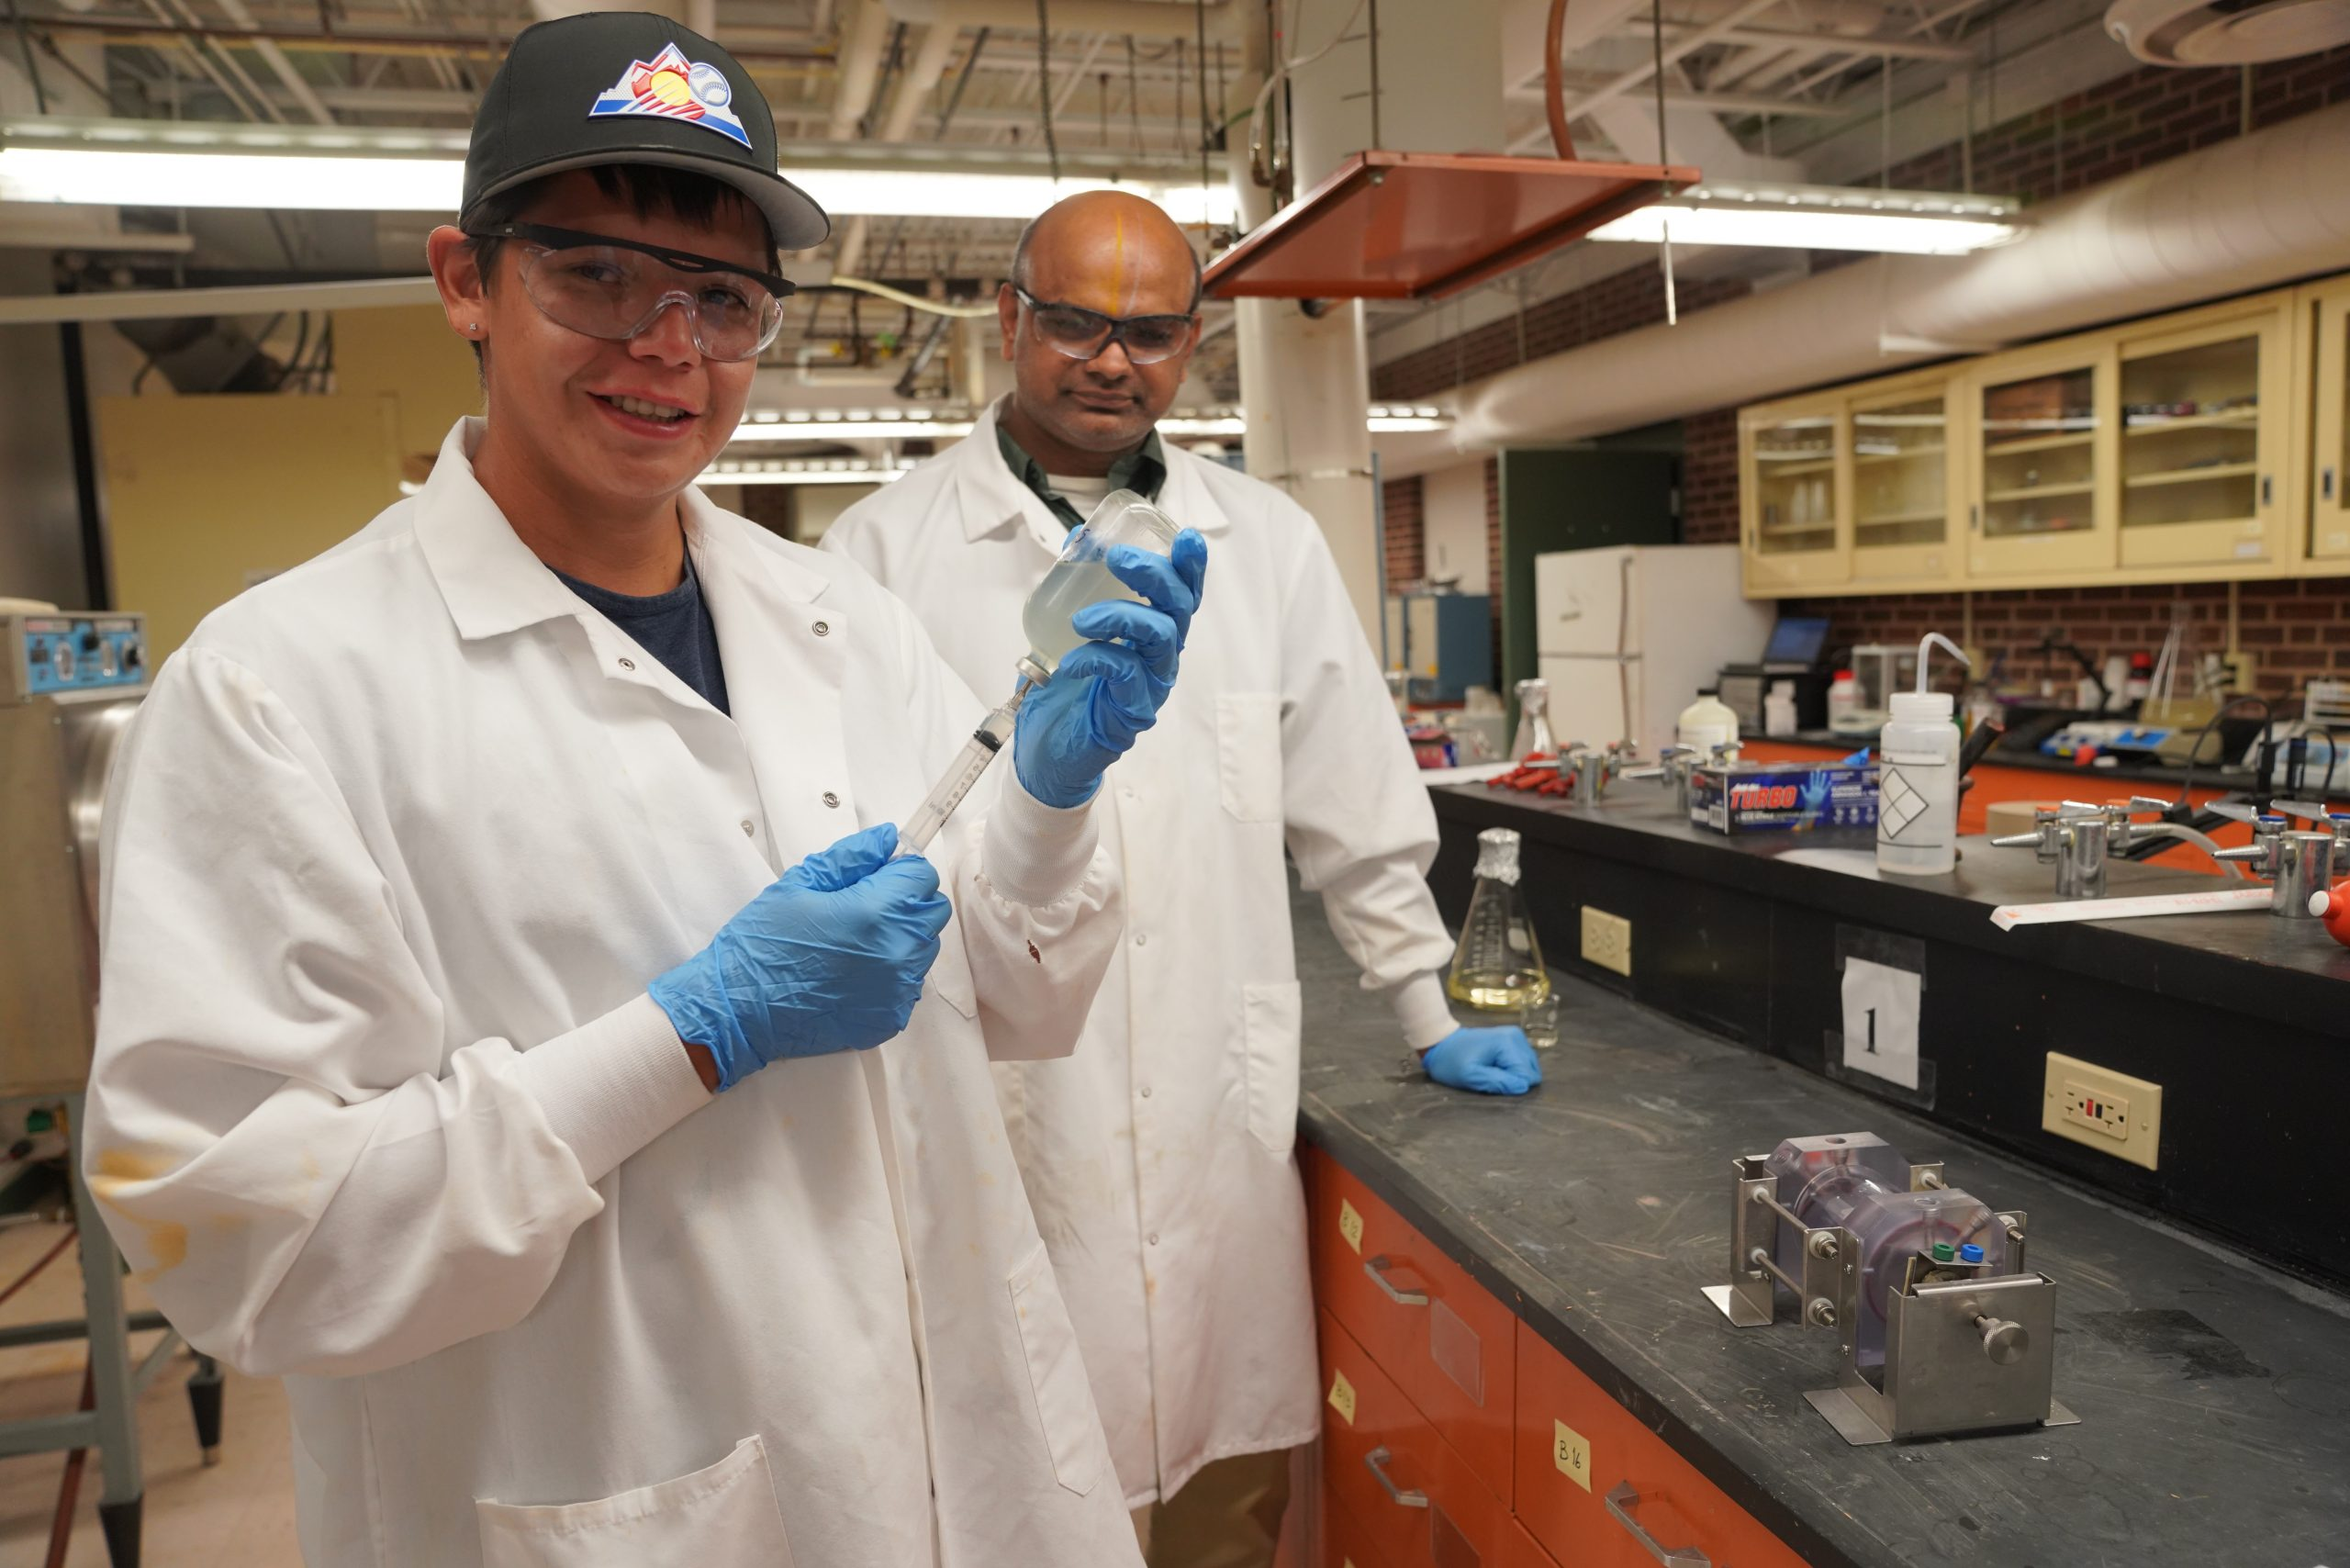 South Dakota EPSCoR | Native American Graduate Program - Shane Starr in the Lab